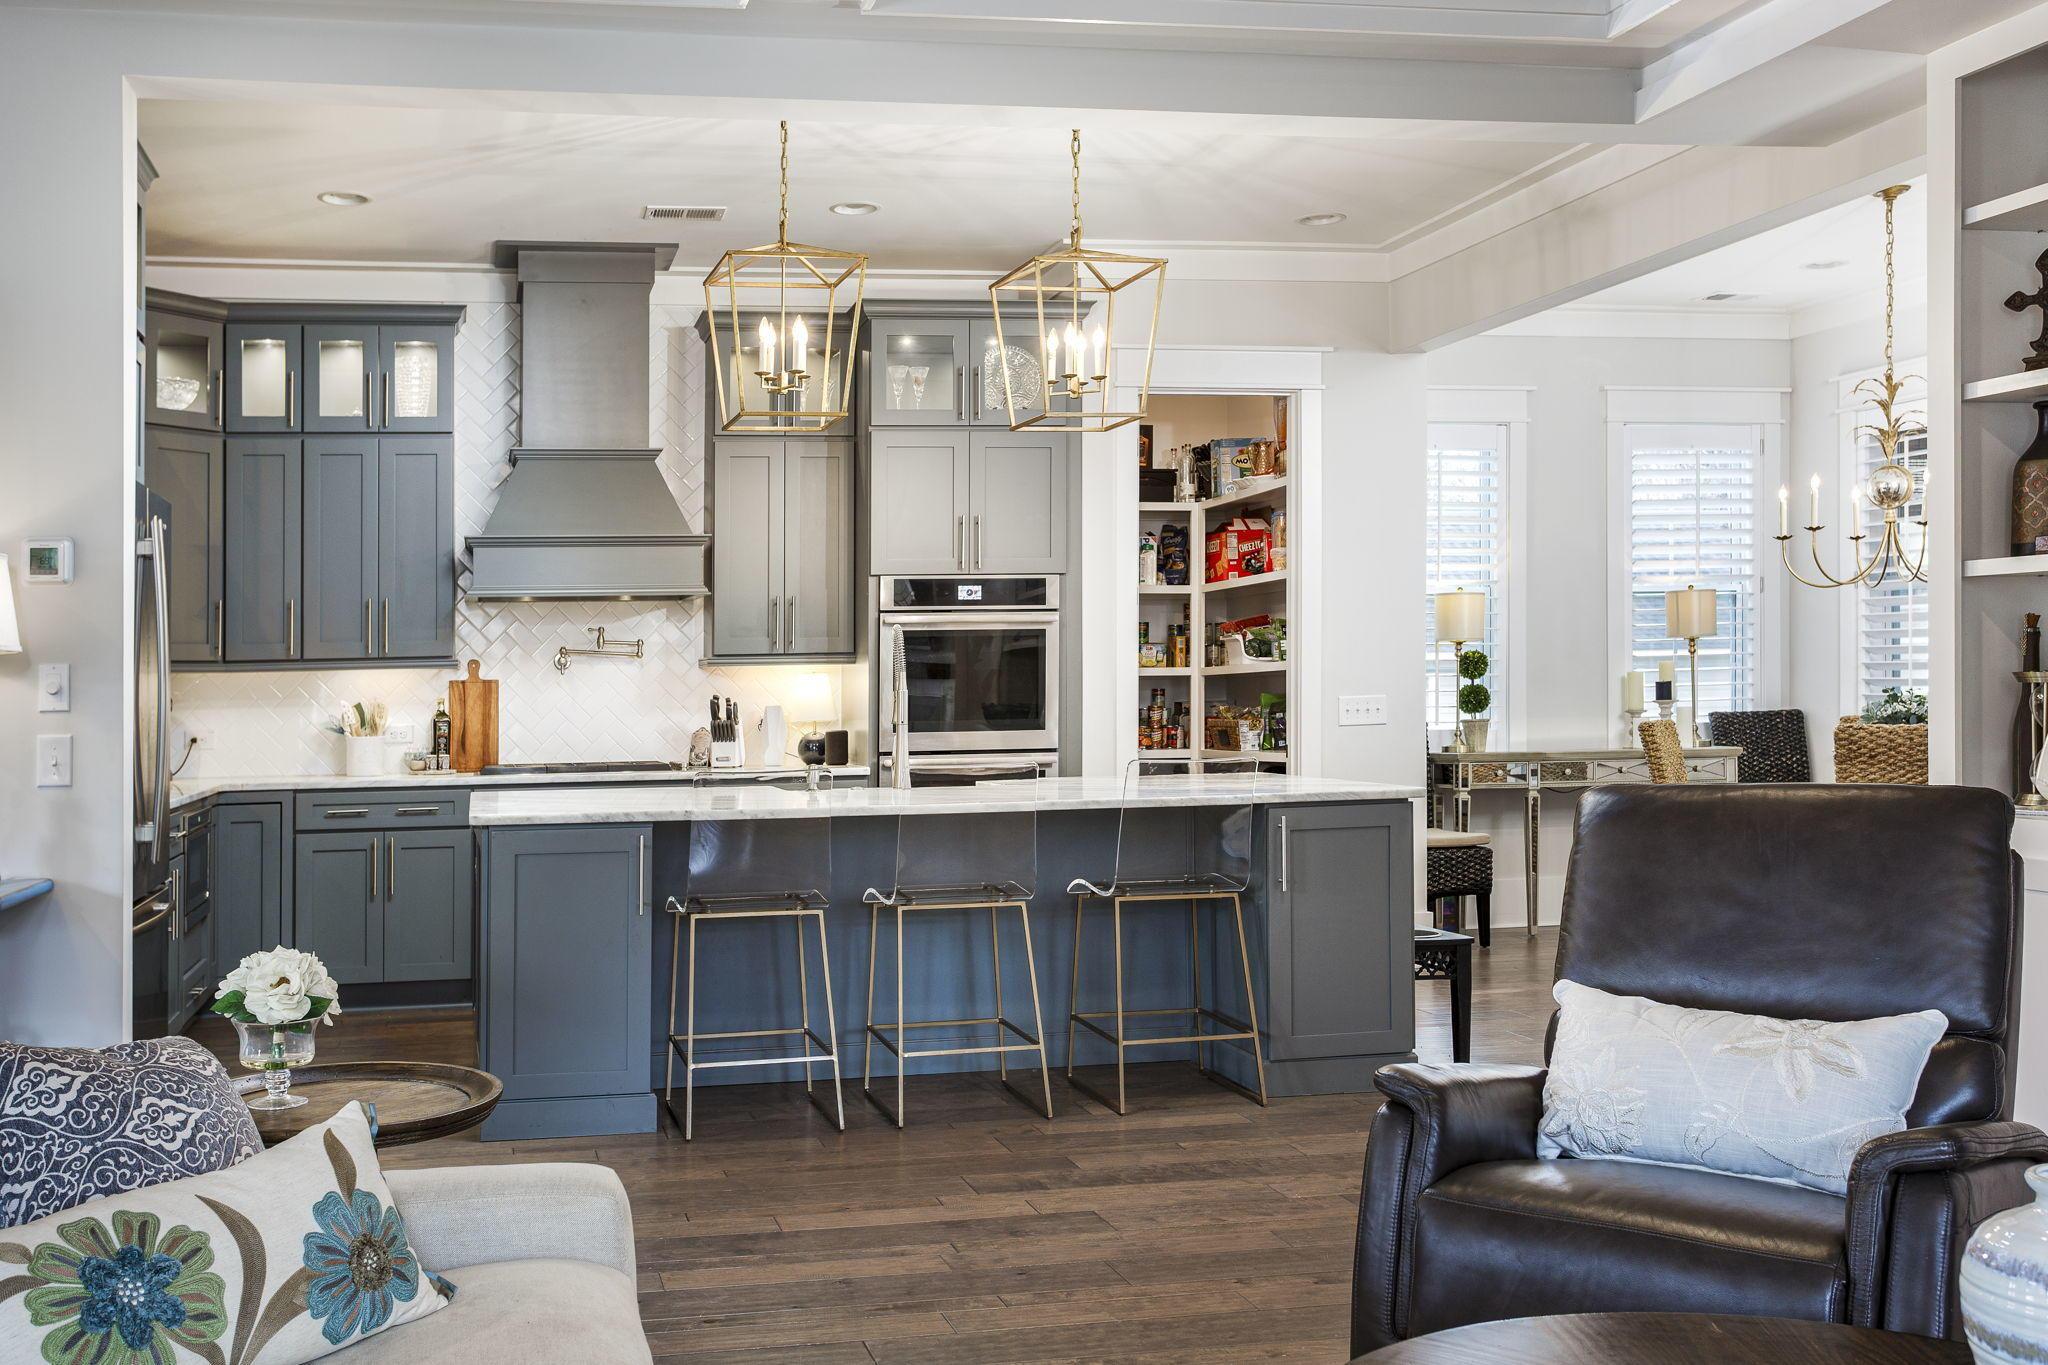 Carolina Park Homes For Sale - 3590 Backshore, Mount Pleasant, SC - 51